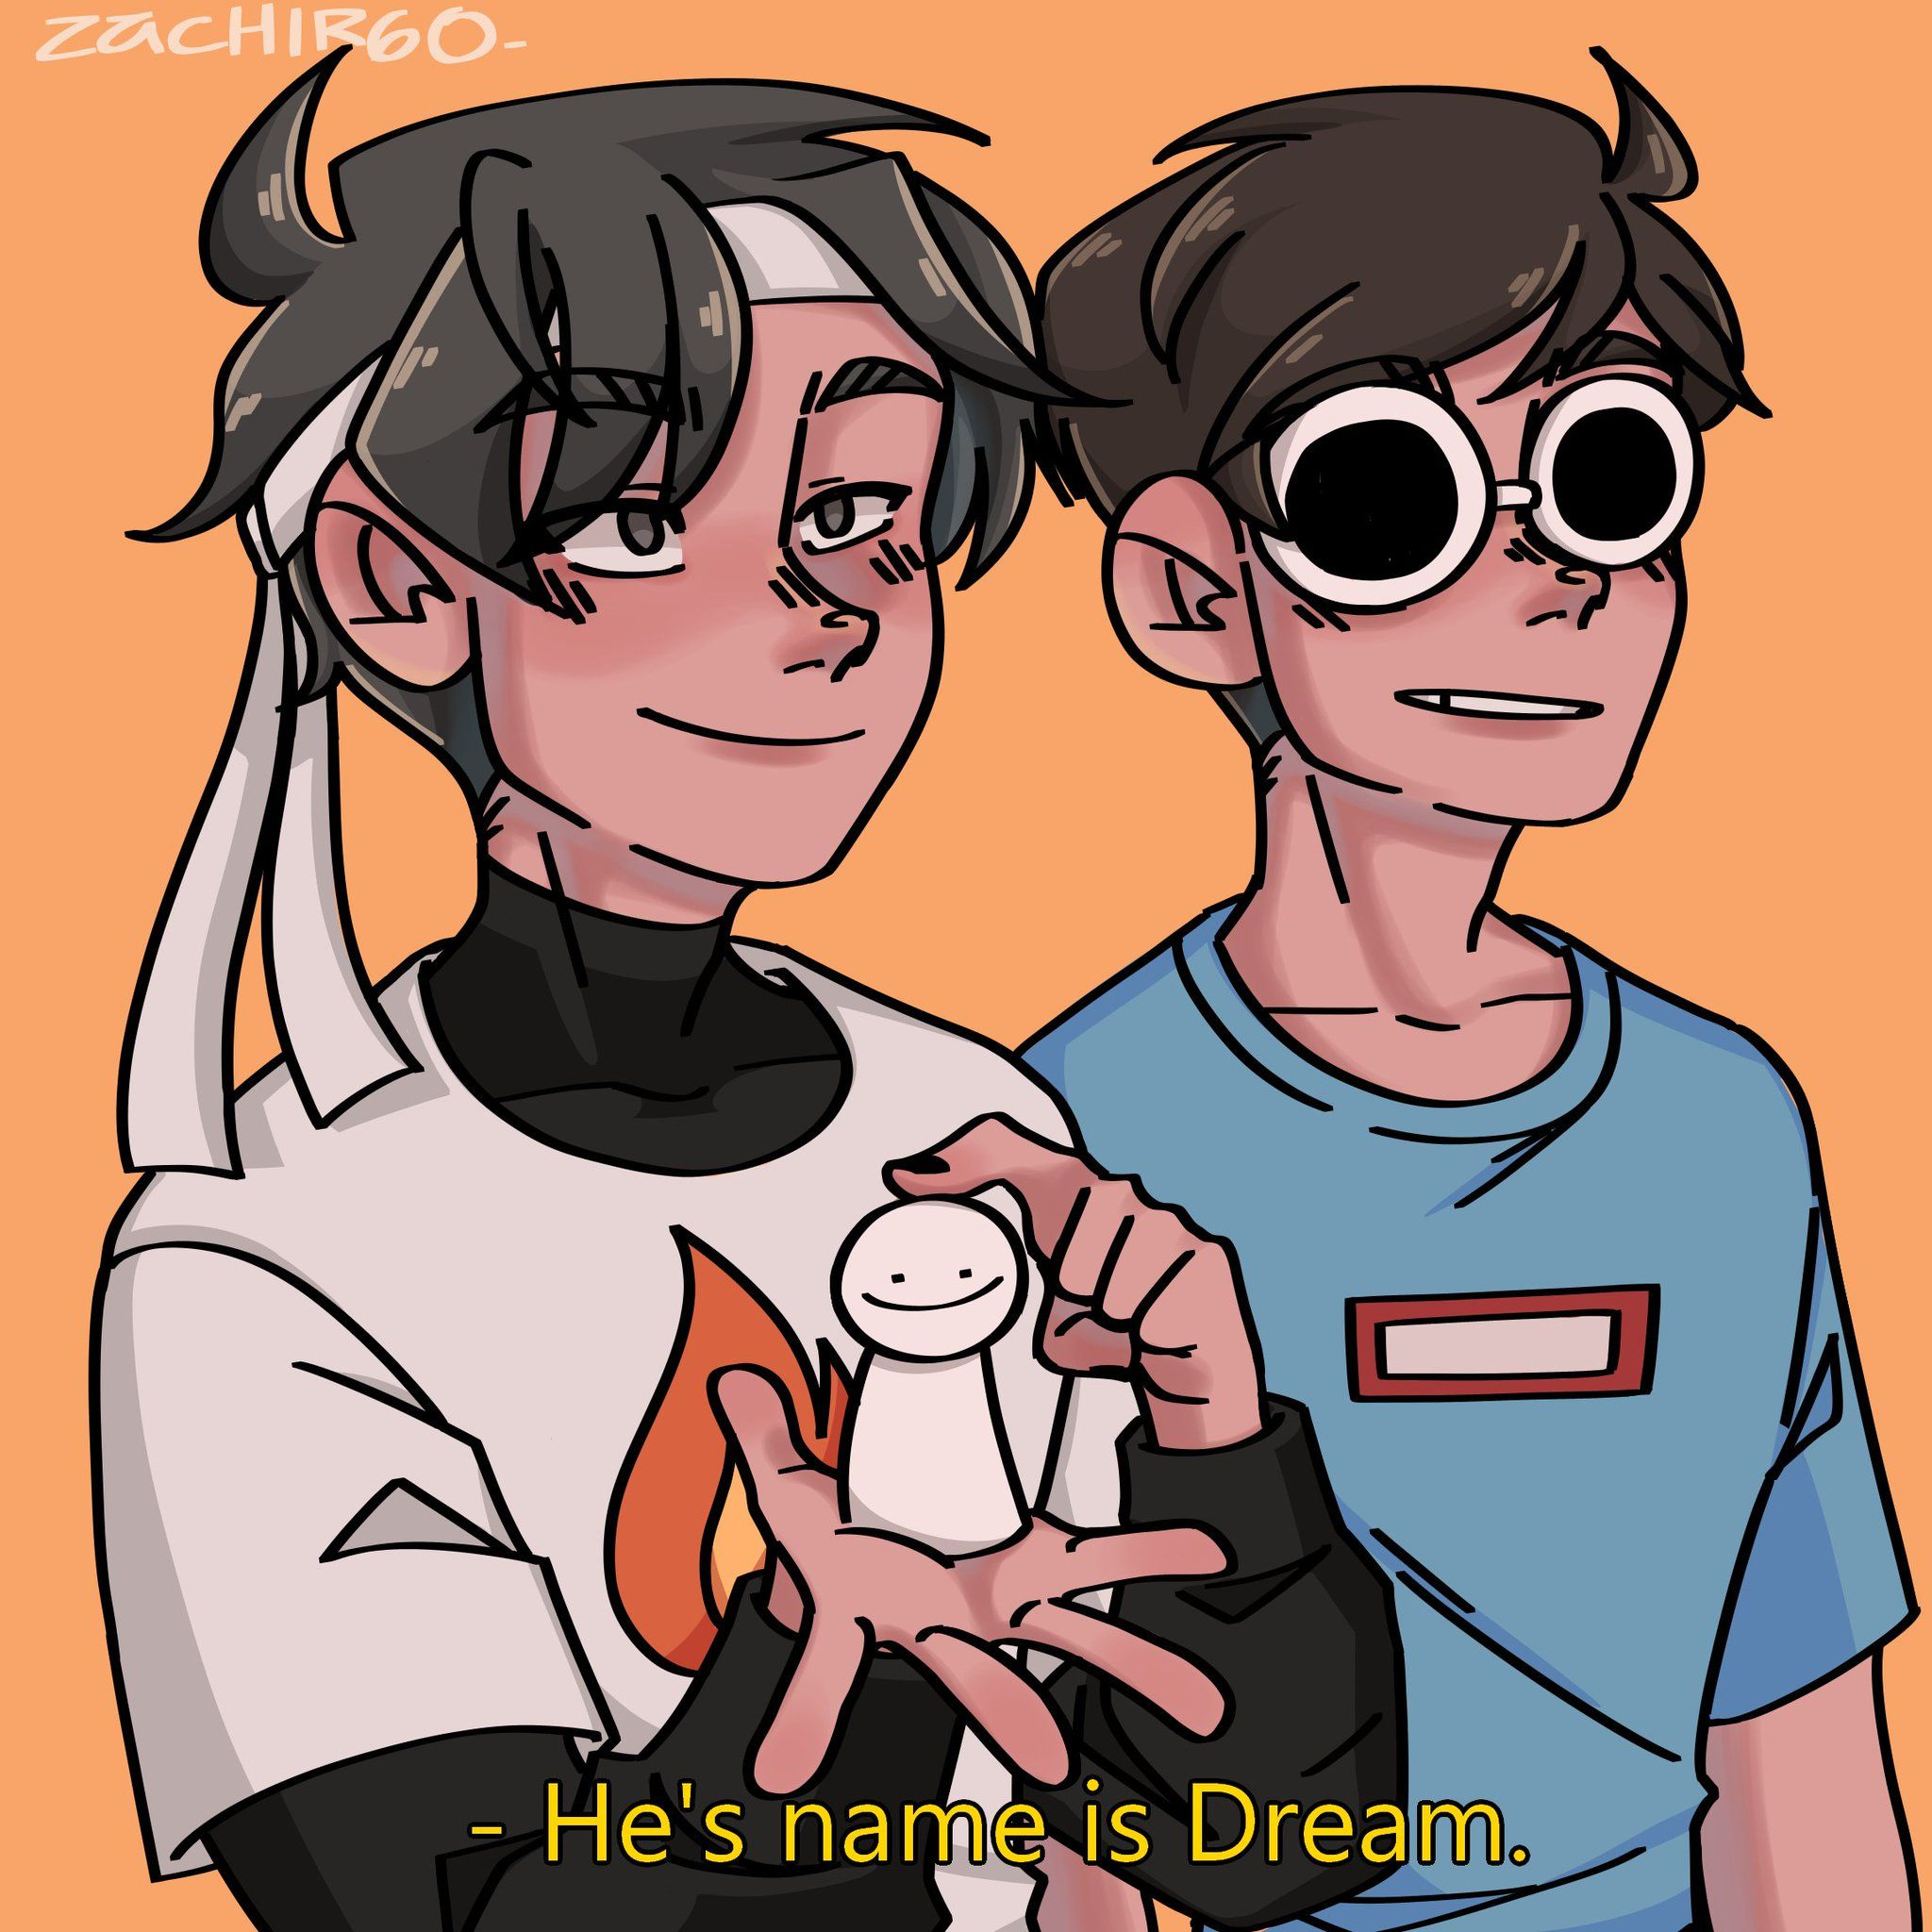 Pin By Cricket On Dream Smp My Dream Team Dream Team Dream Friends